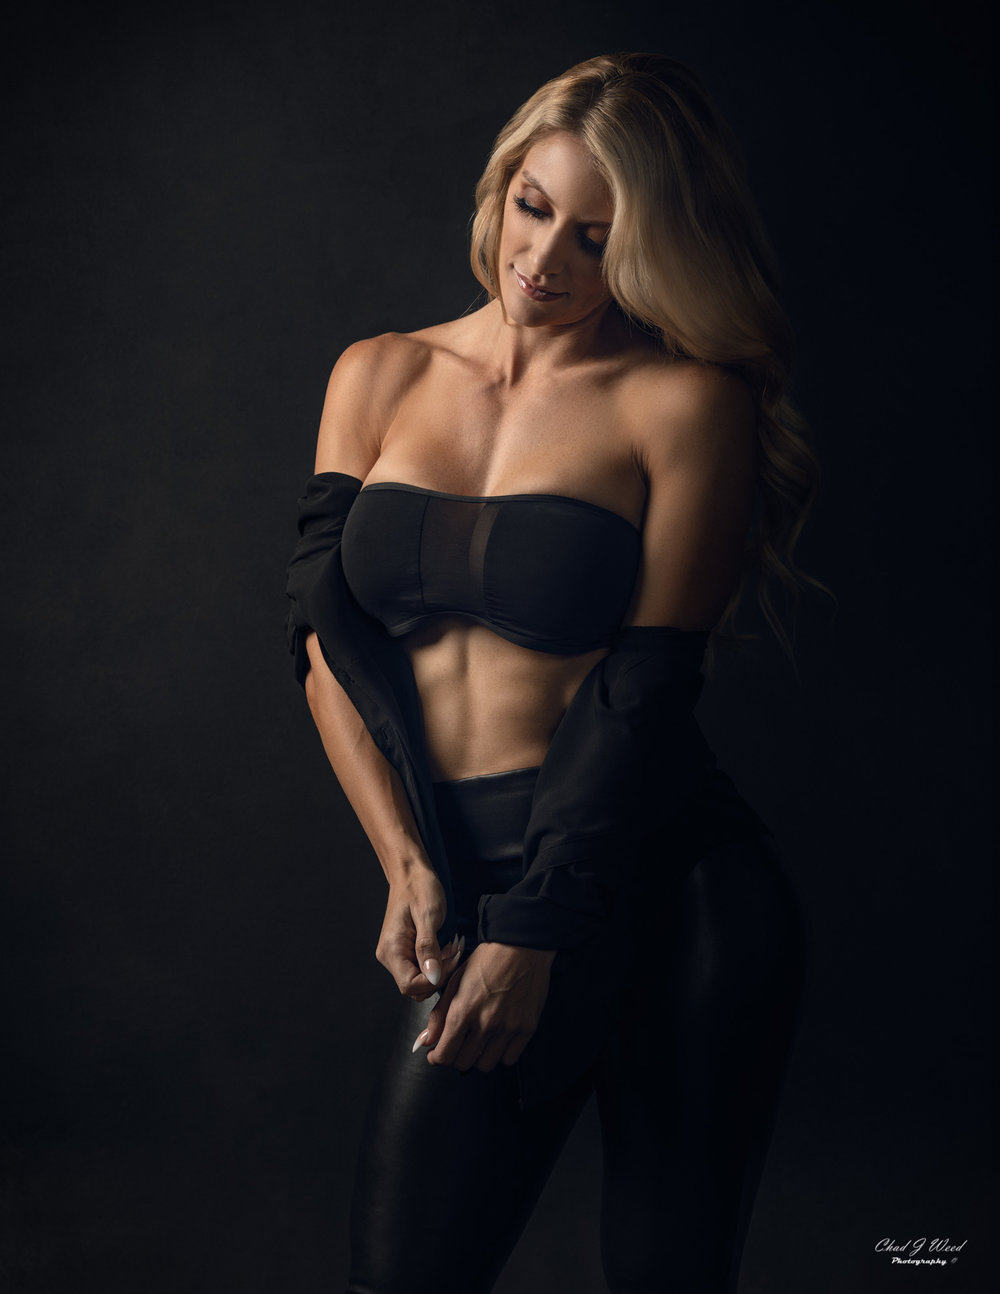 Mesa Arizona Fashion Photographer Chad Weed with Glamour Model Kristi